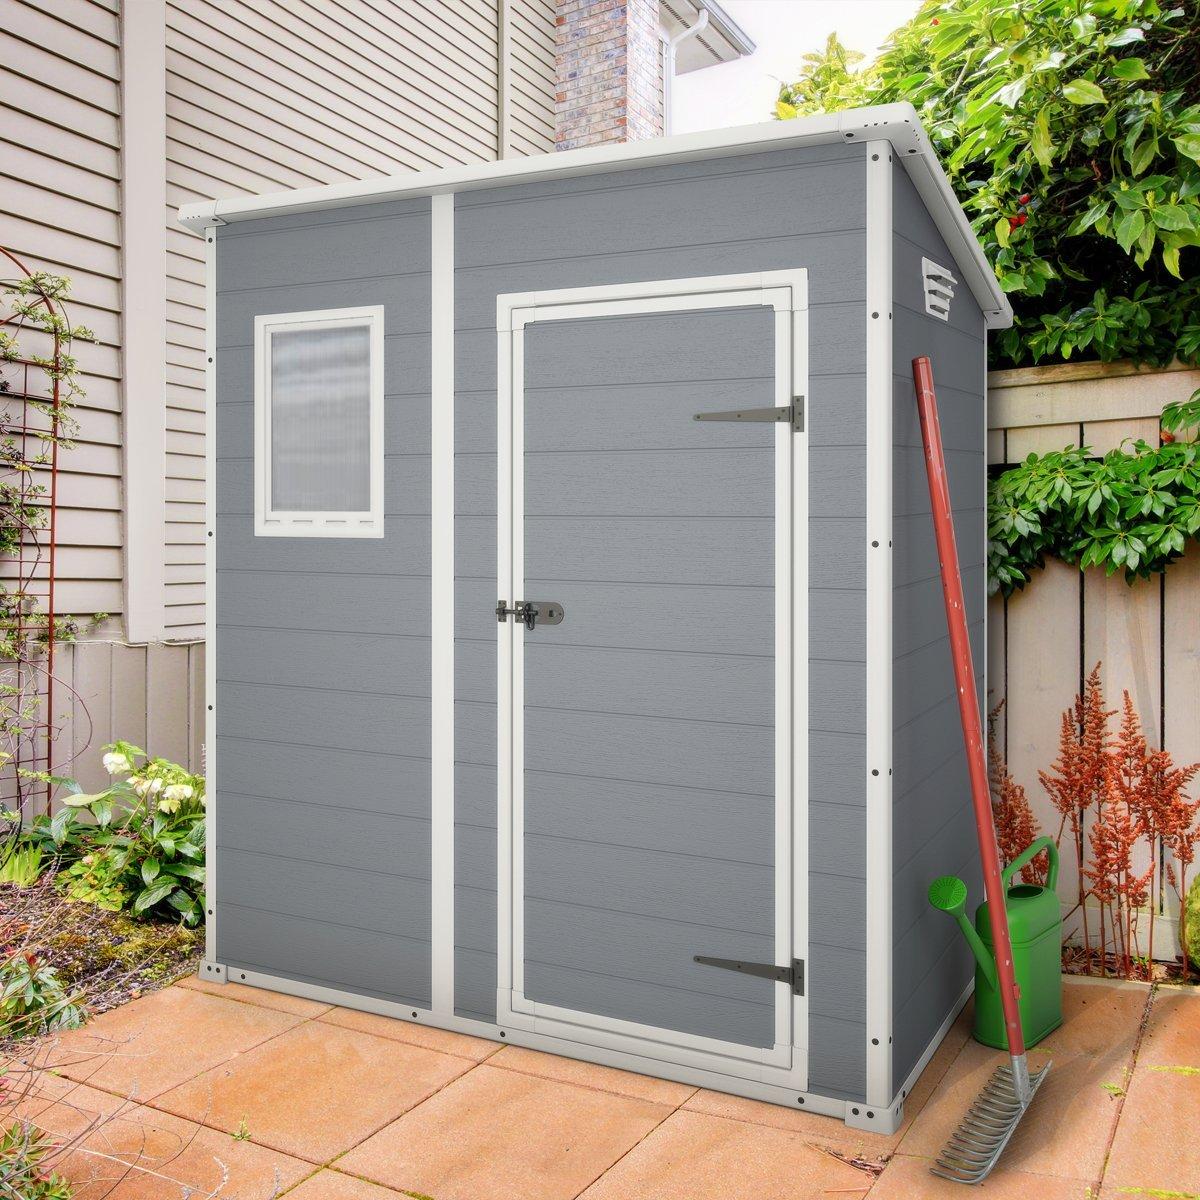 abri jardin petite taille l 39 habis. Black Bedroom Furniture Sets. Home Design Ideas